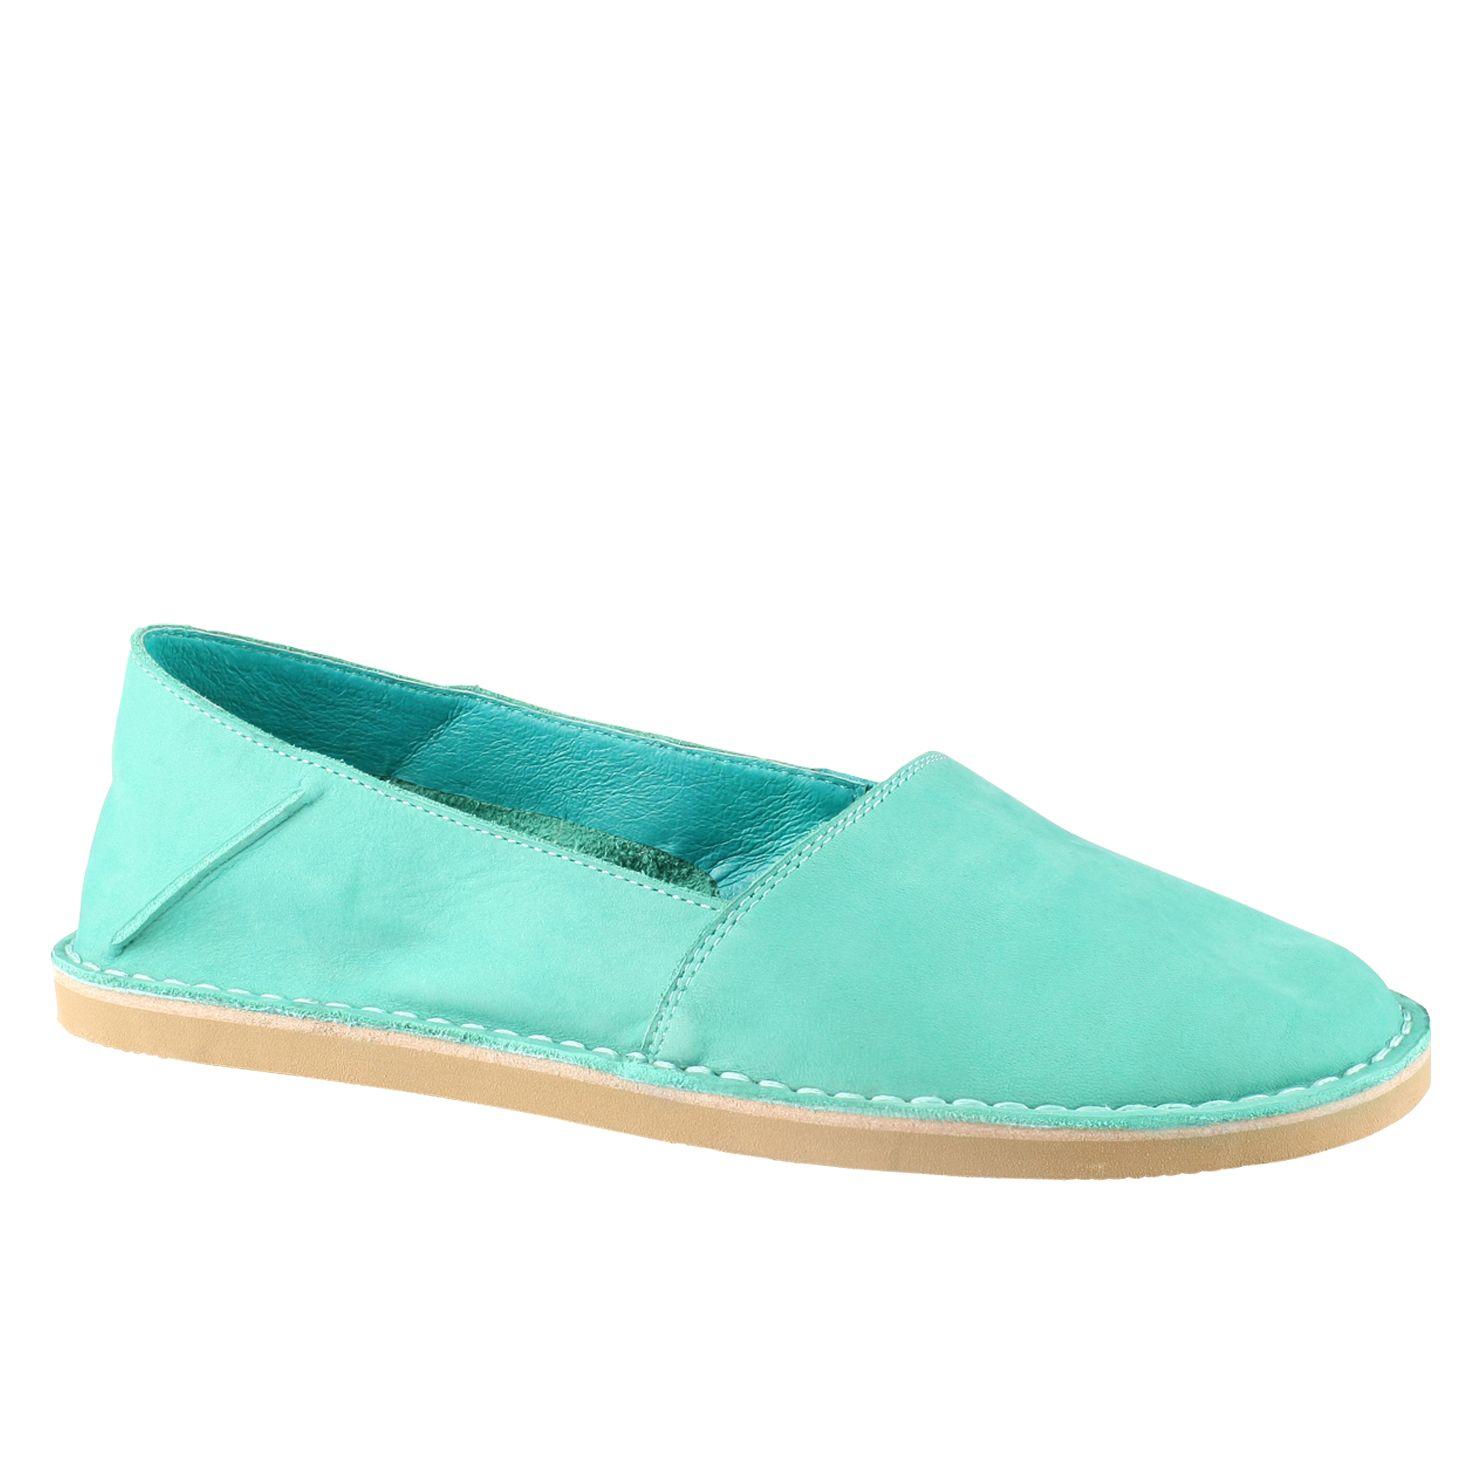 Best Flat Shoes For Work Australia